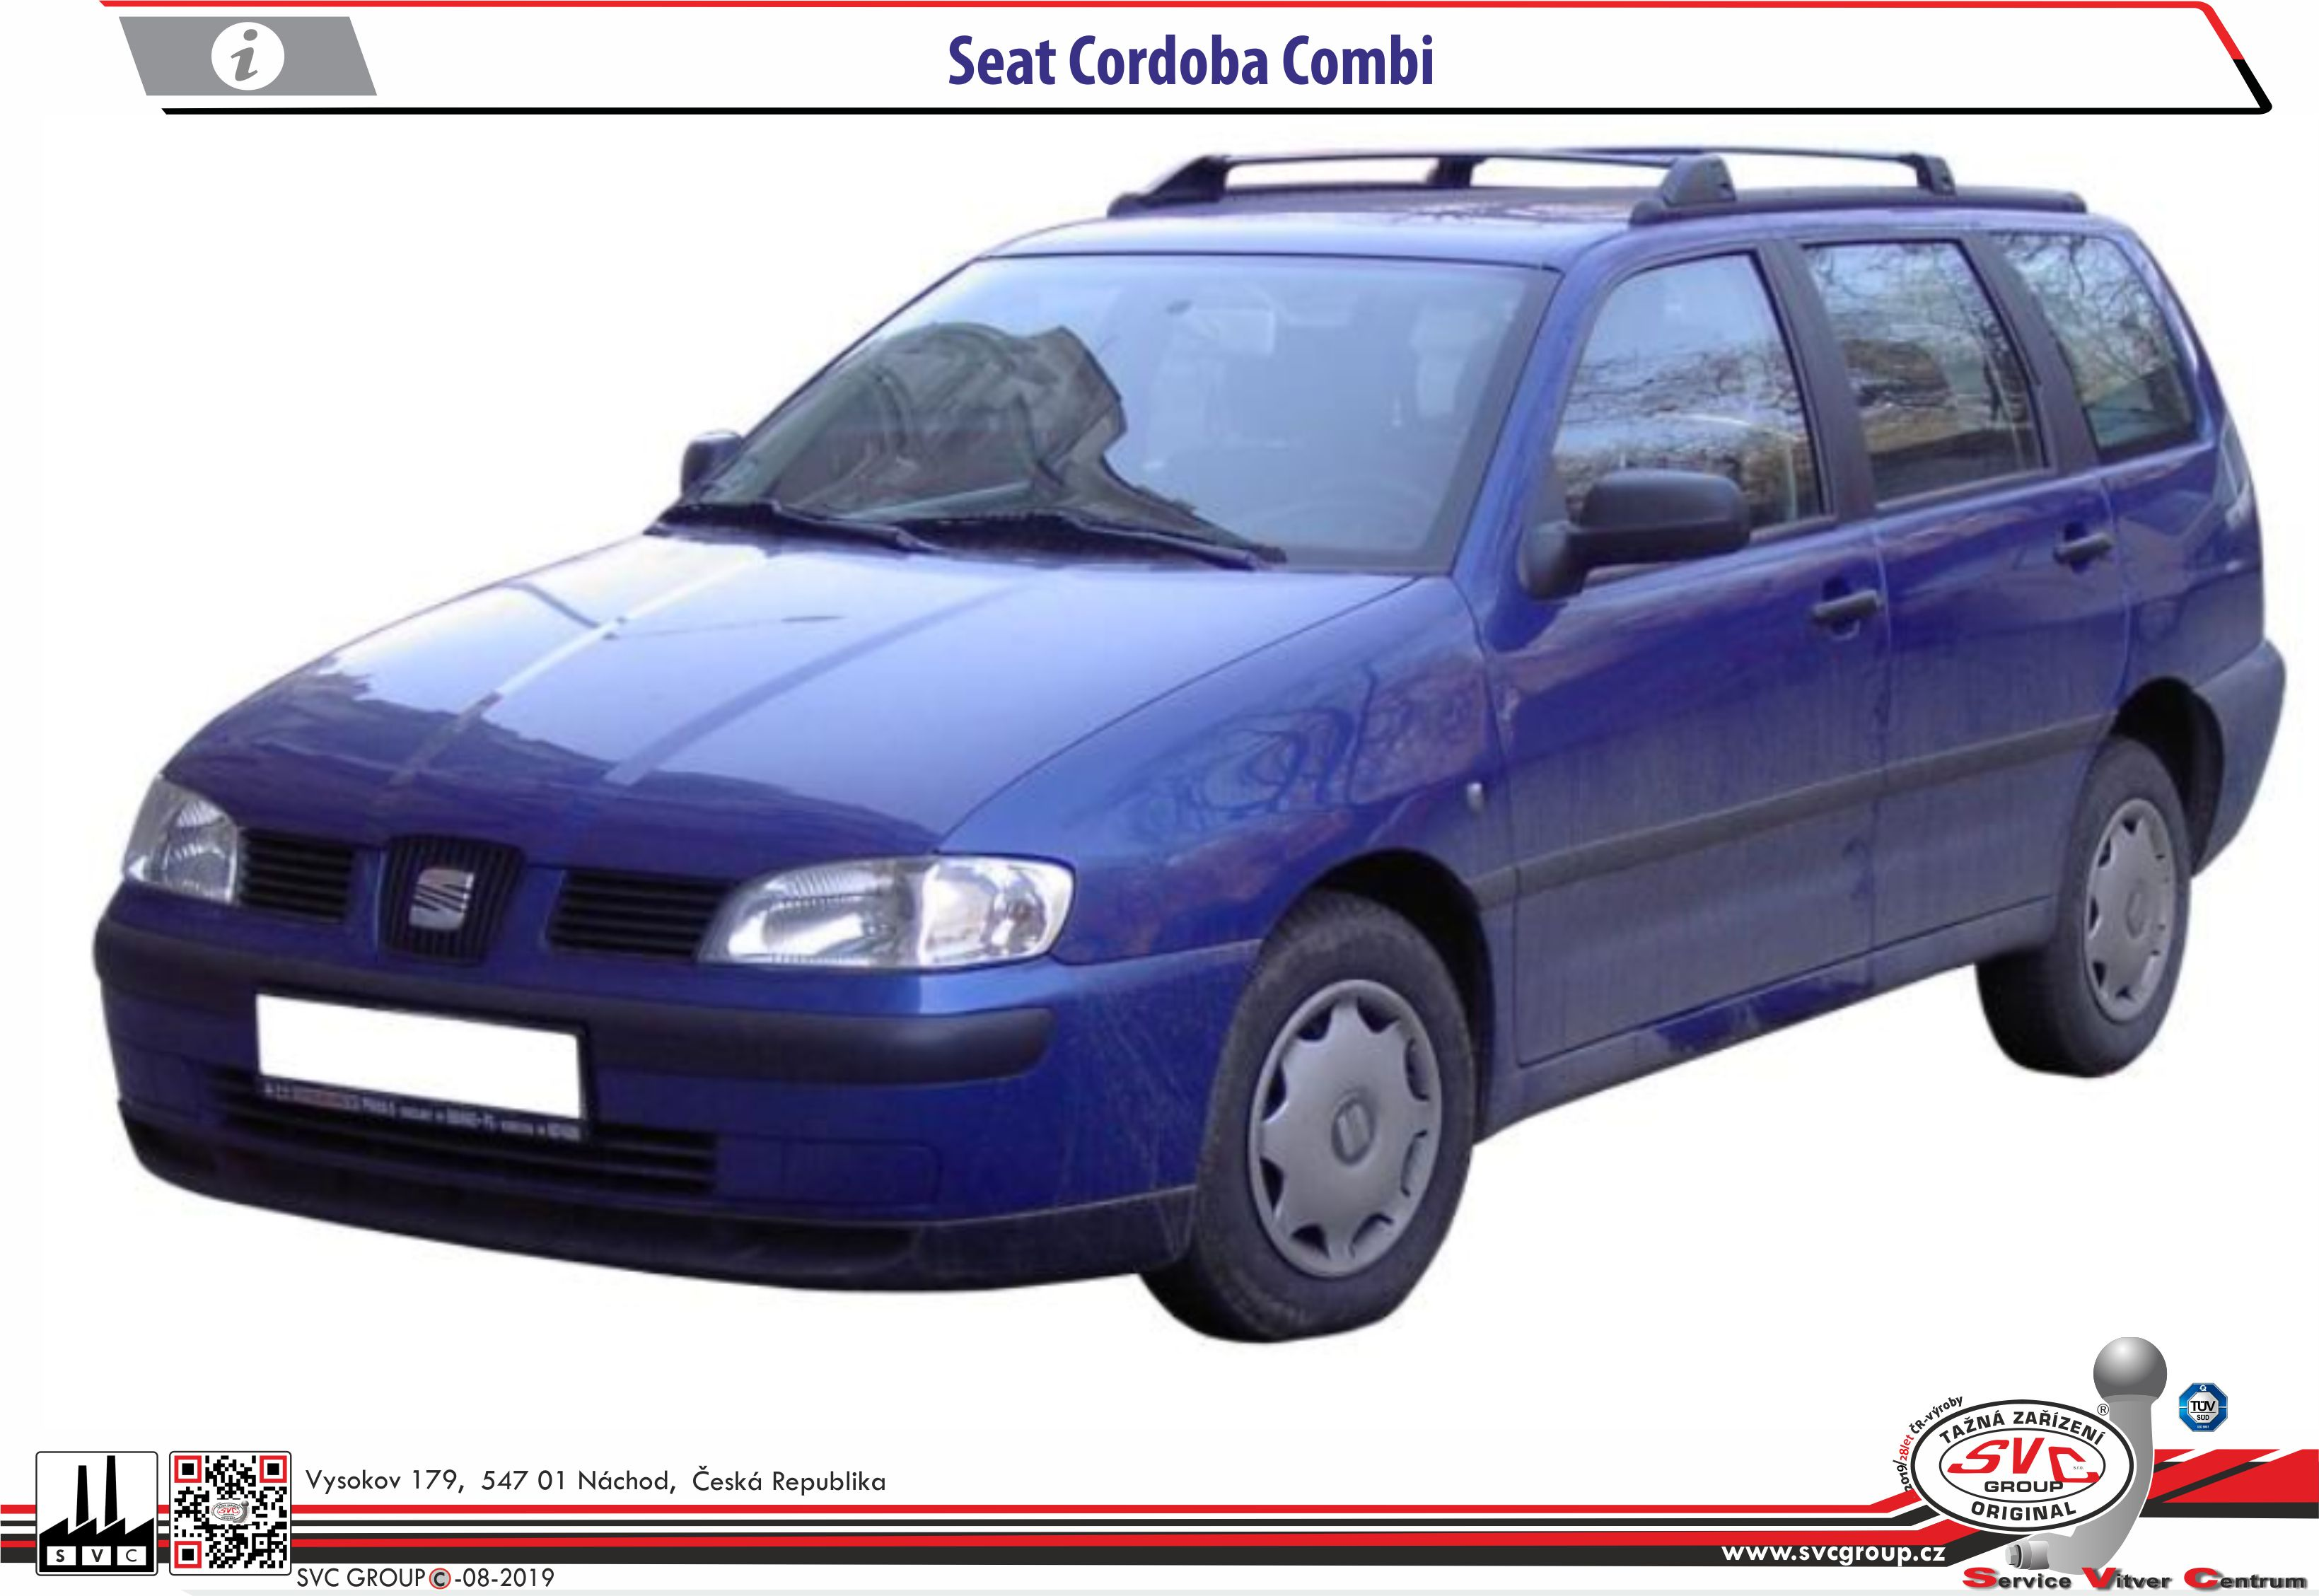 Seat Cordoba Kombi